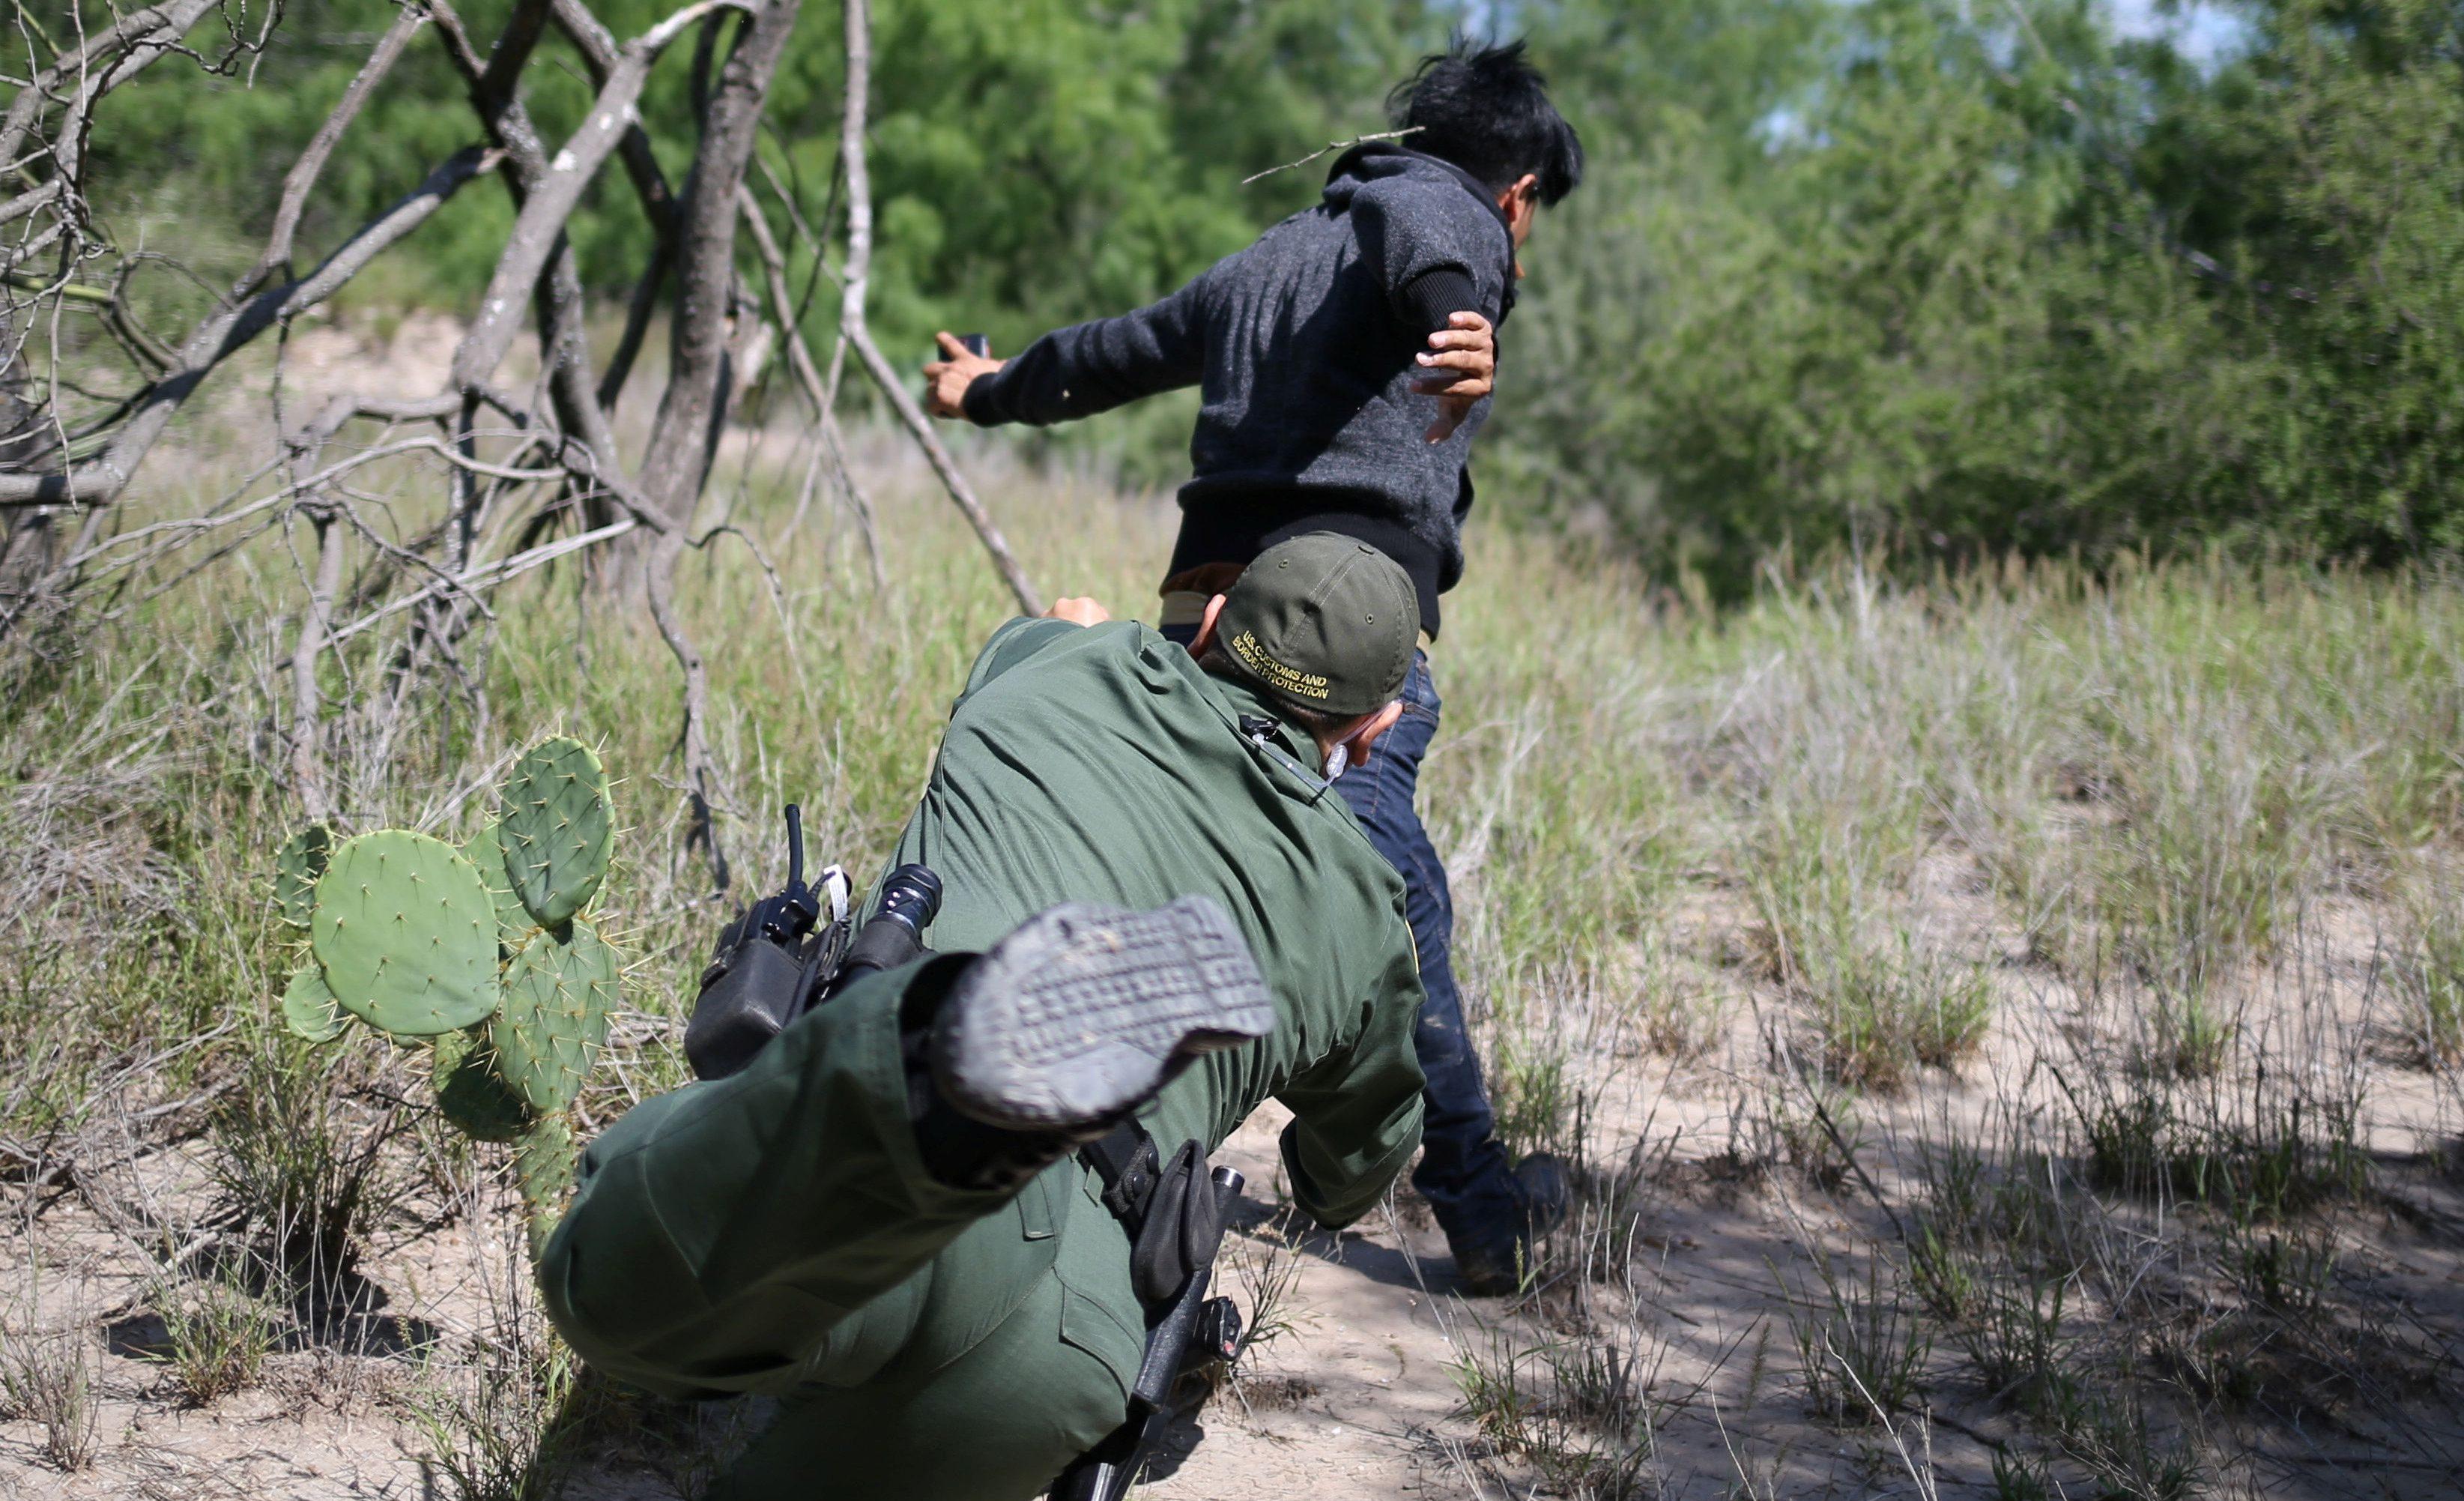 A man who illegally crossed the Mexico-U.S. border evades a U.S. Border Patrol agent near McAllen, Texas, U.S., May 8, 2018.